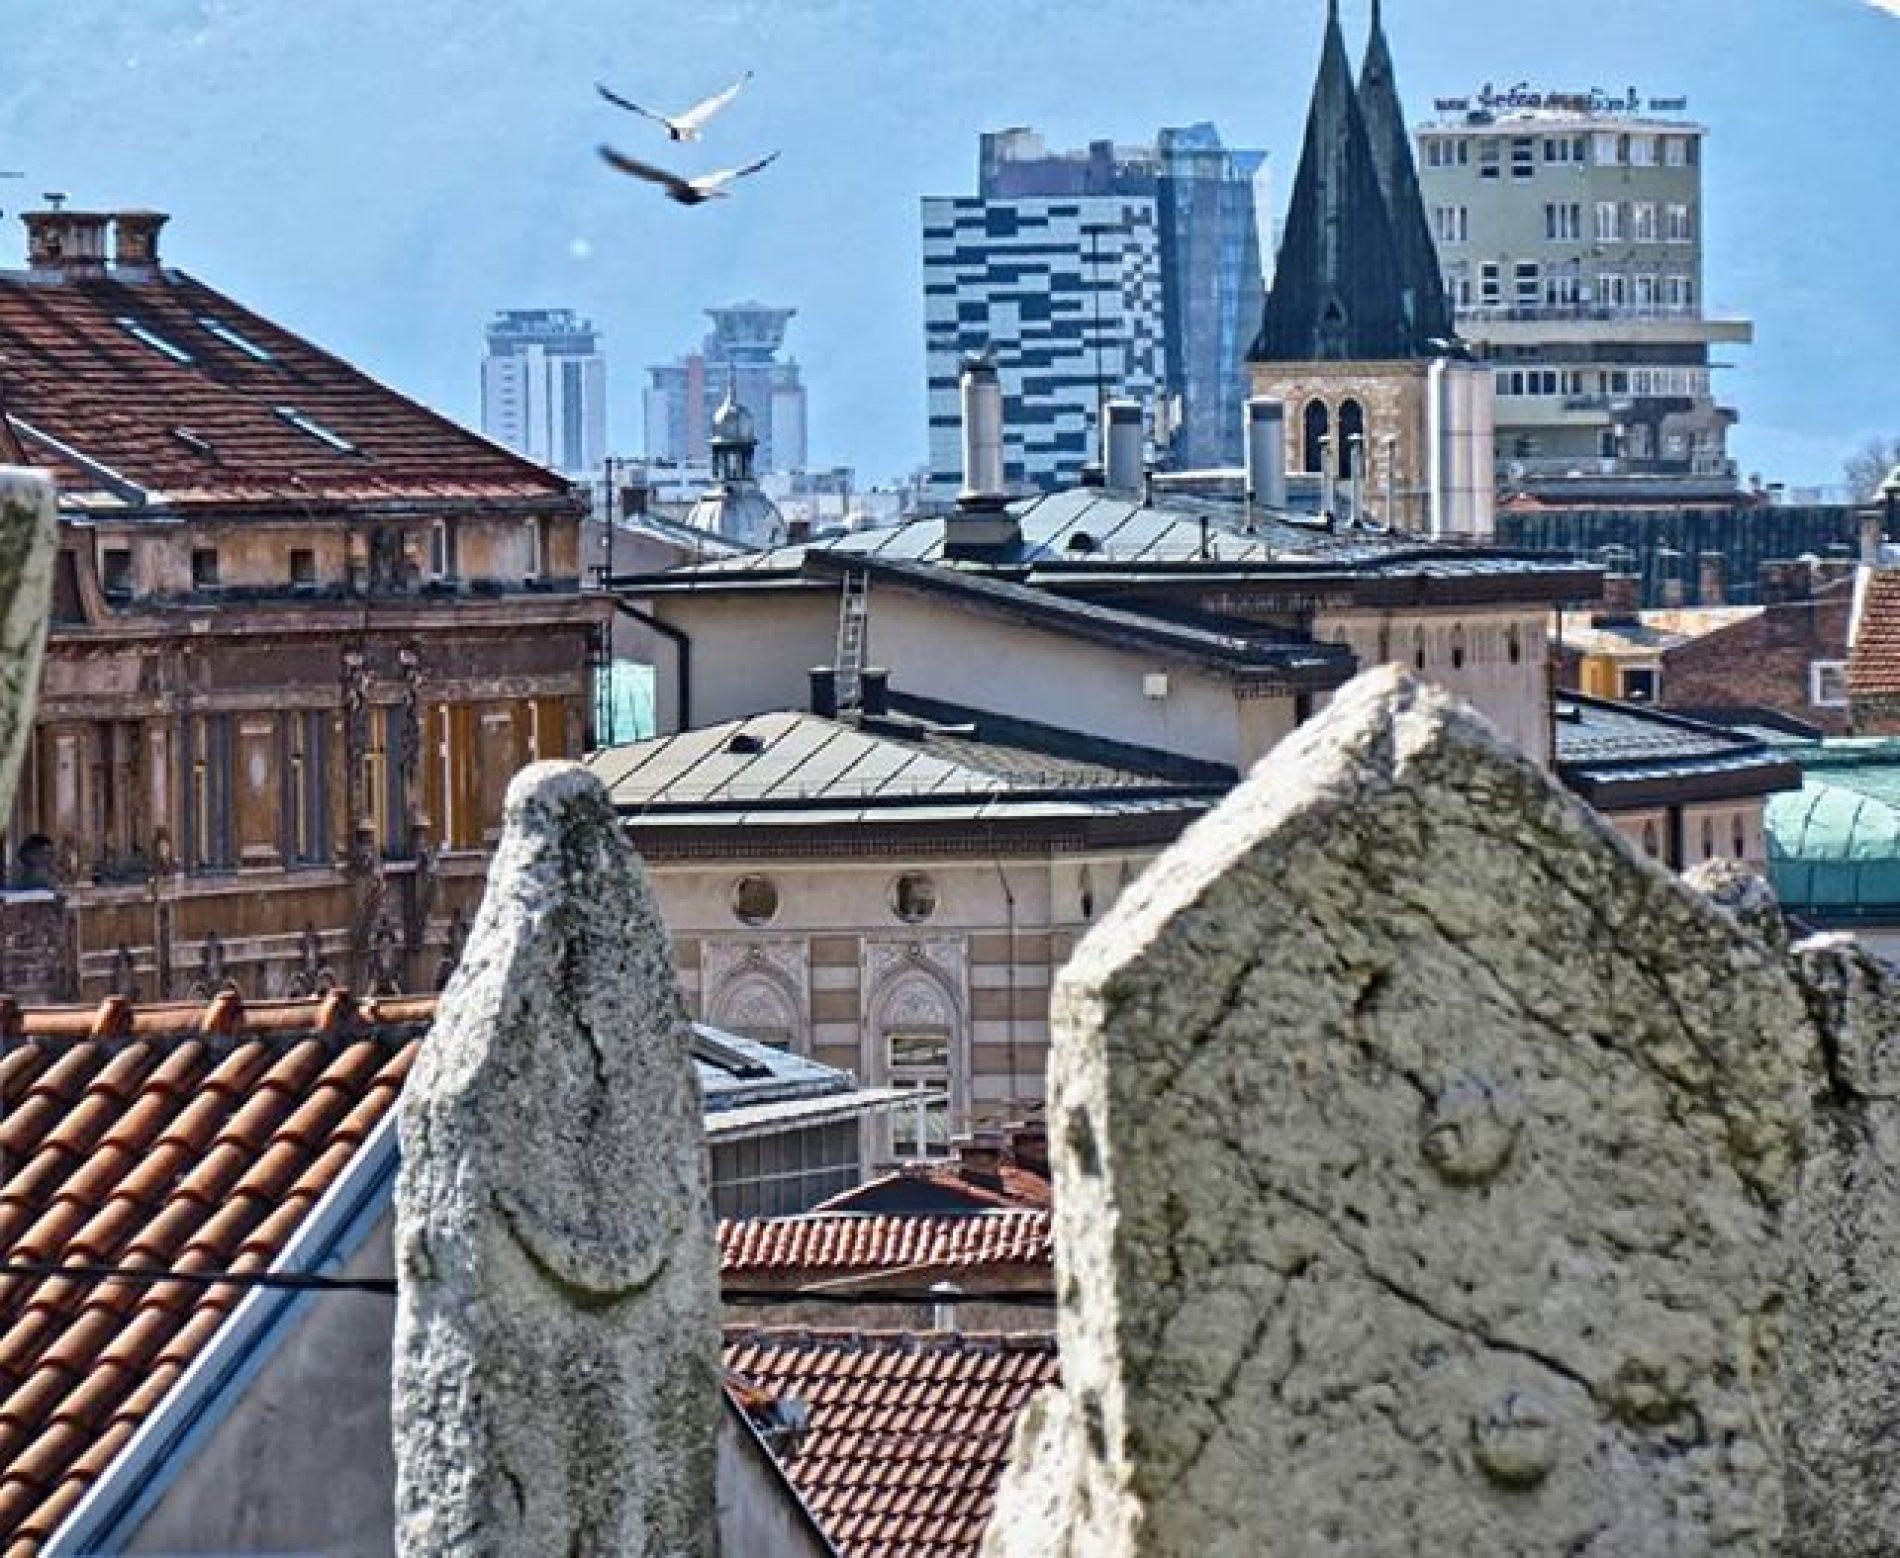 Vakufnama Isa-bega Ishakovića: Rodni list Sarajeva